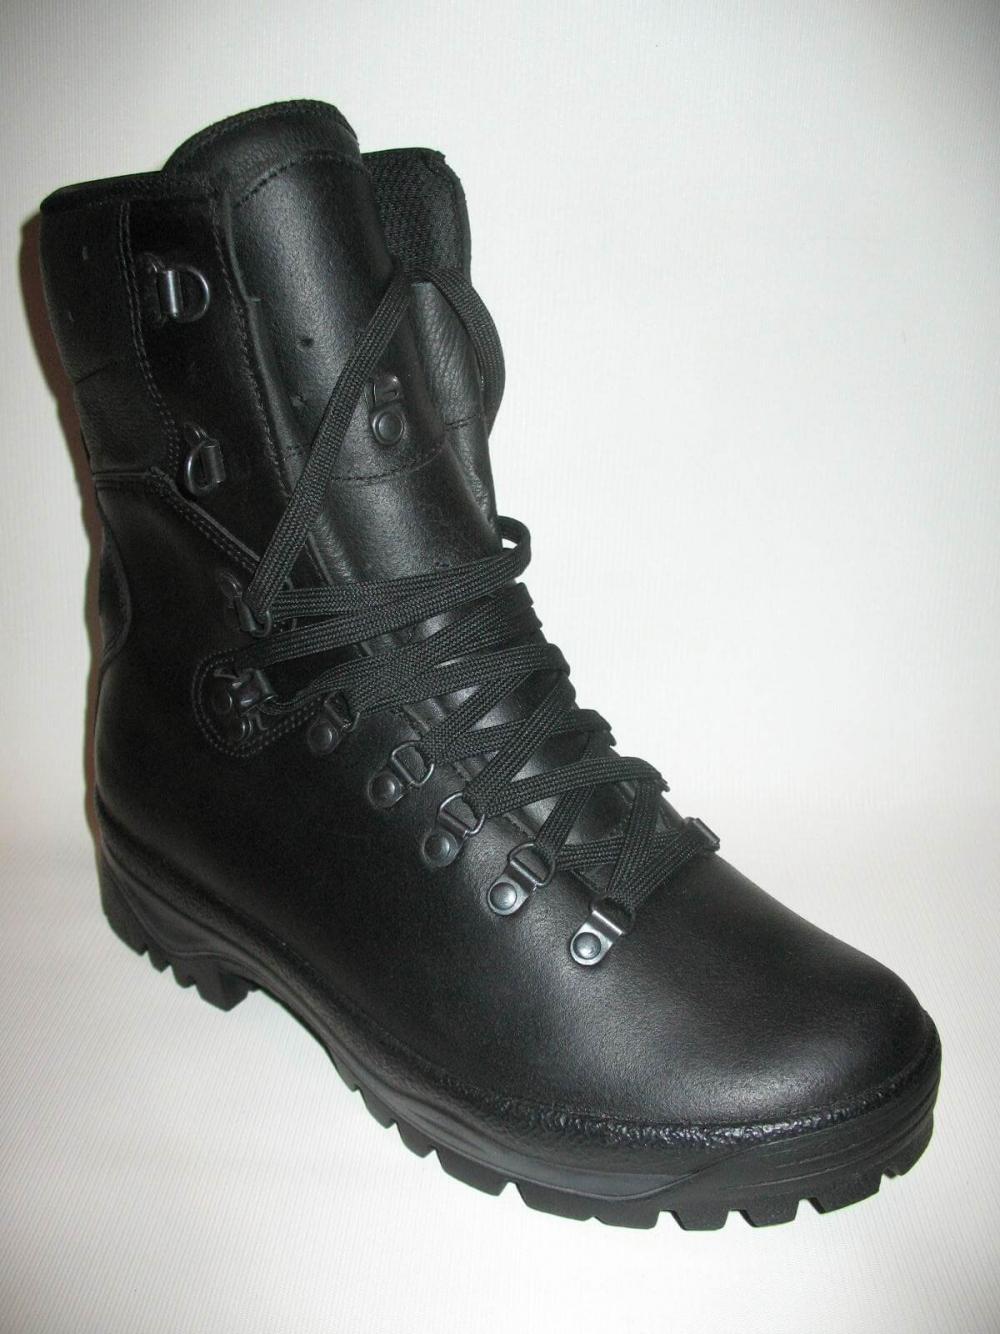 Ботинки MEINDL army boots (размер EU42(на стопу до 270mm)) - 1